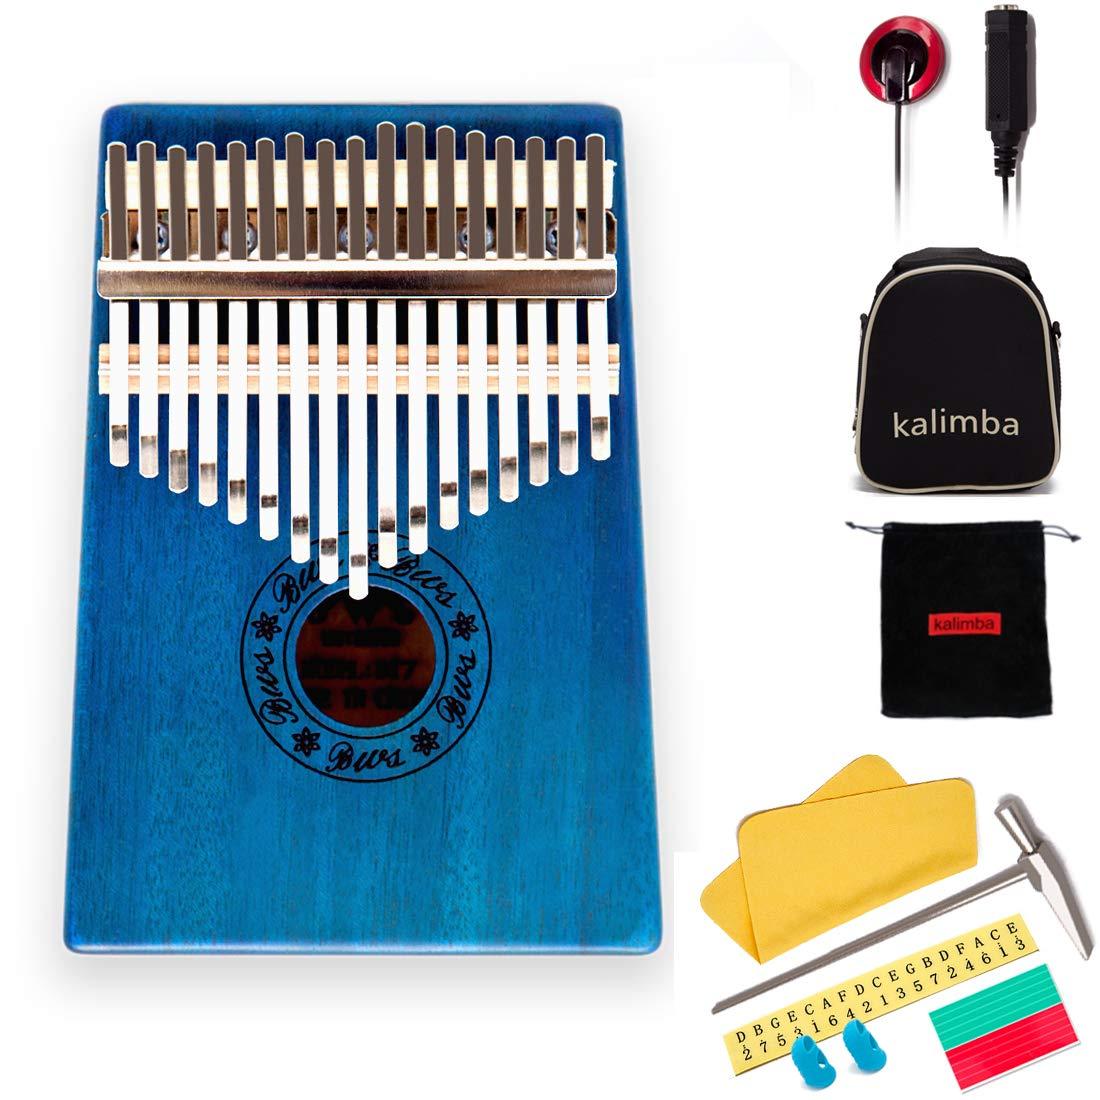 17 Keys Kalimba Thumb Piano Mbira Sanza Mahogany Body, with Multifunctional pickupsand Tune Hammer, for Beginners and Advanced Players suylngla